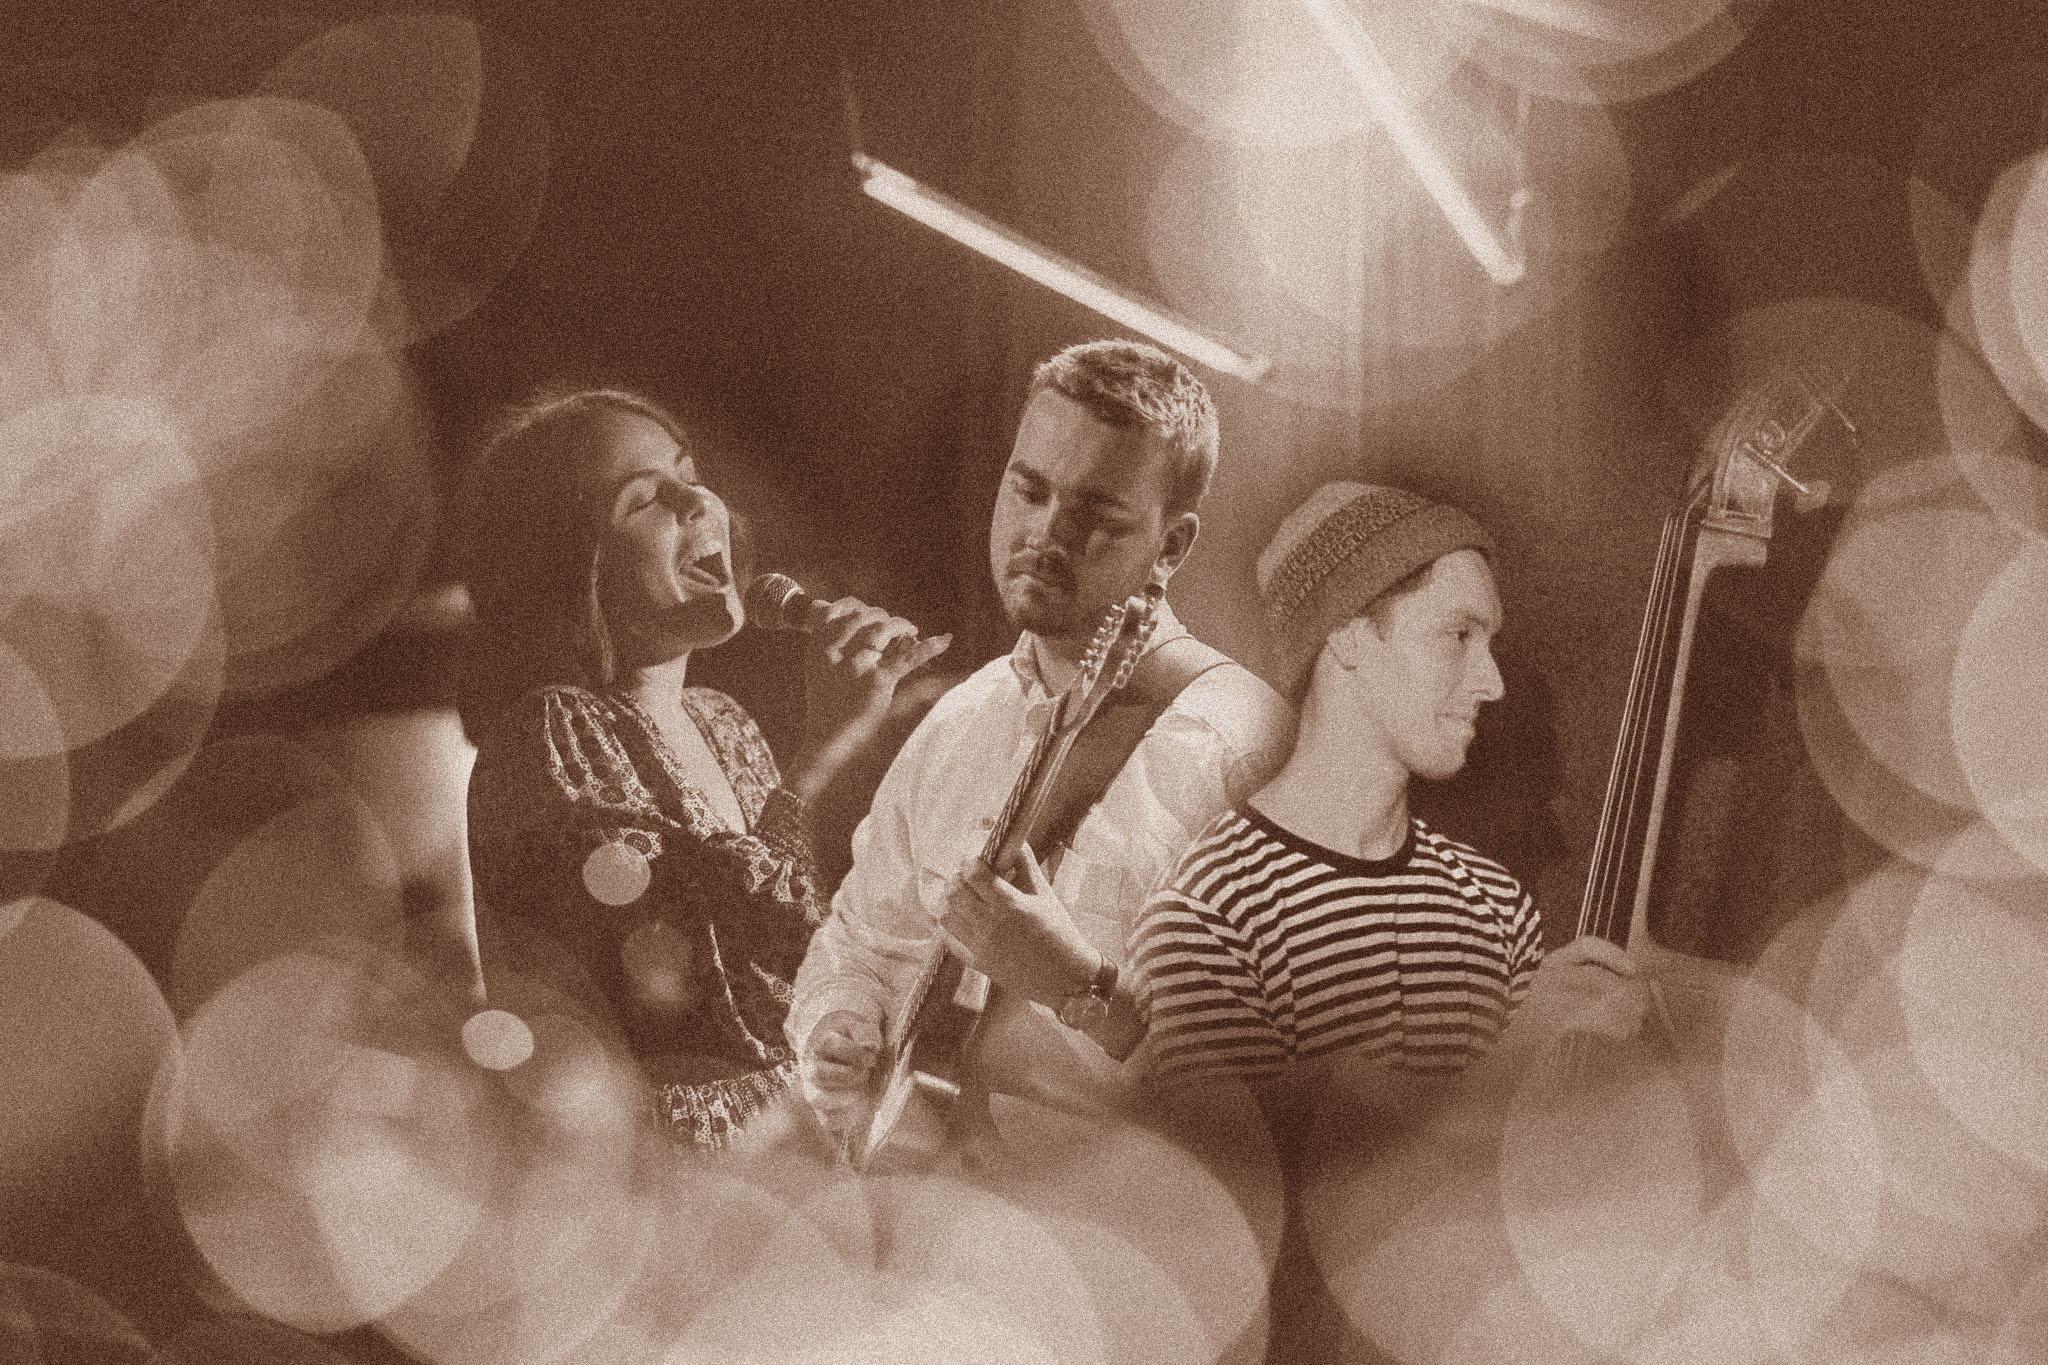 Lucy Iffla, Matthew Gudgeon and Alistair Peel